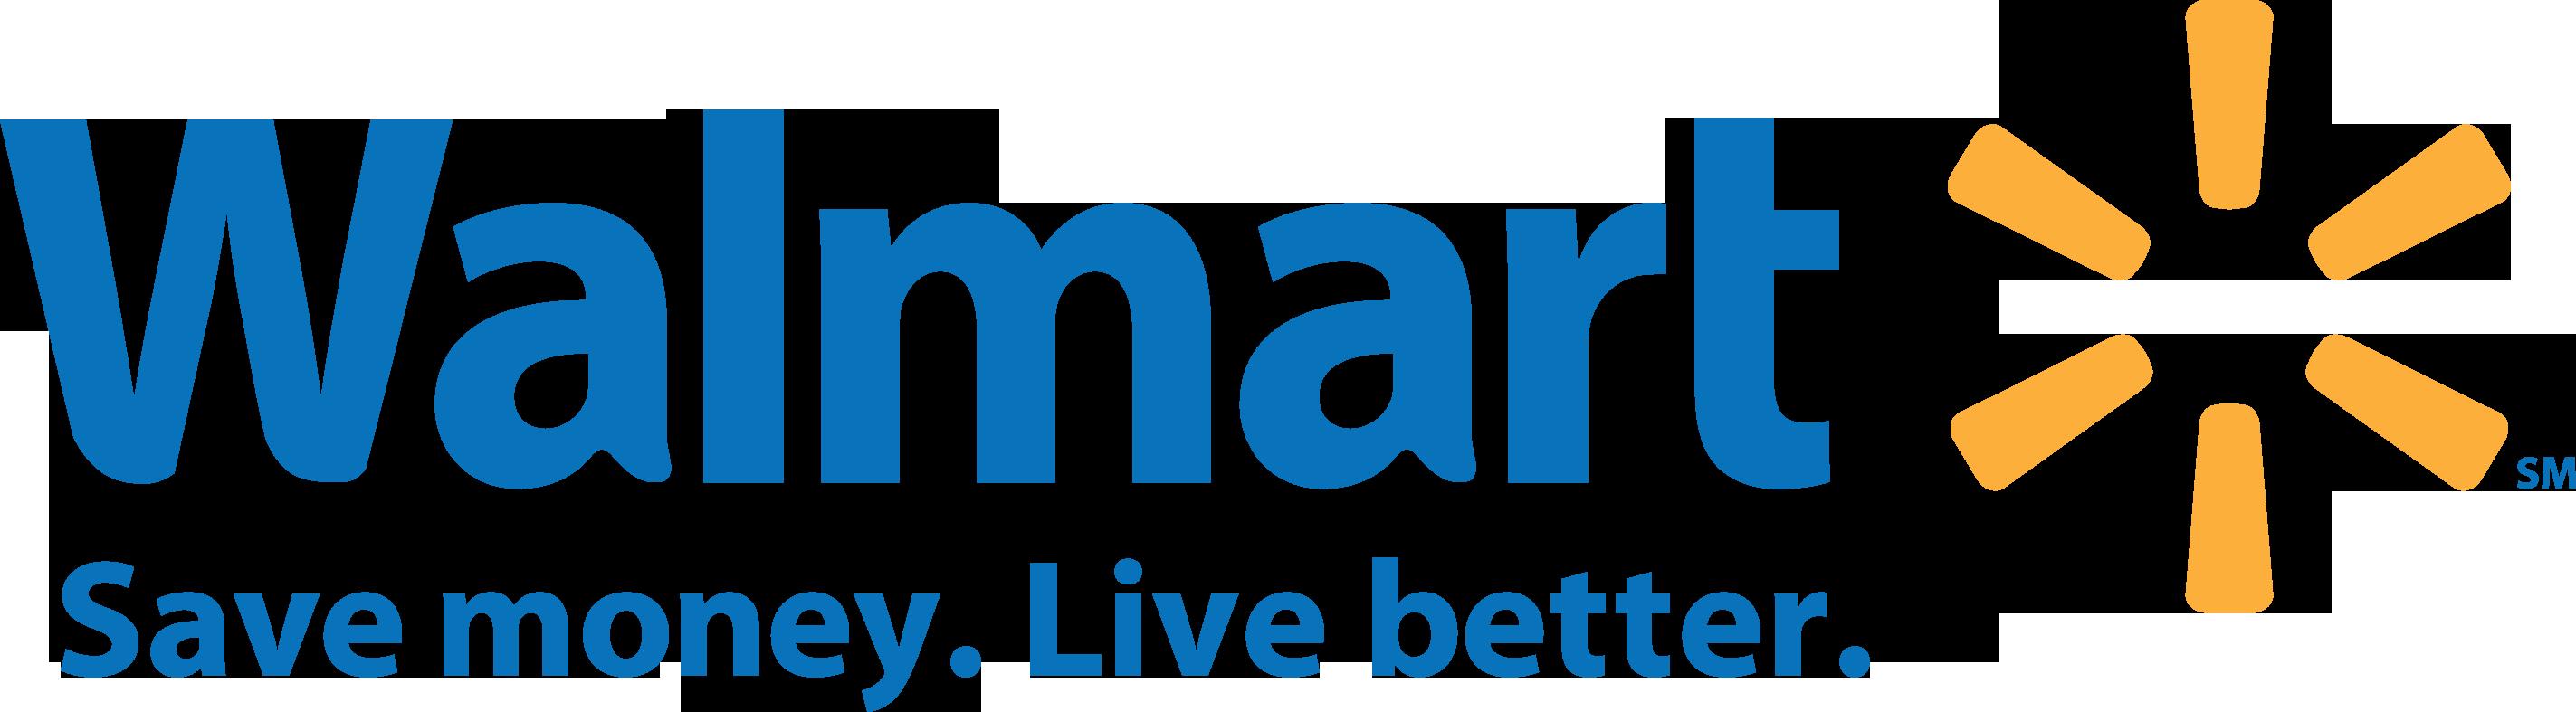 walmart logo #459